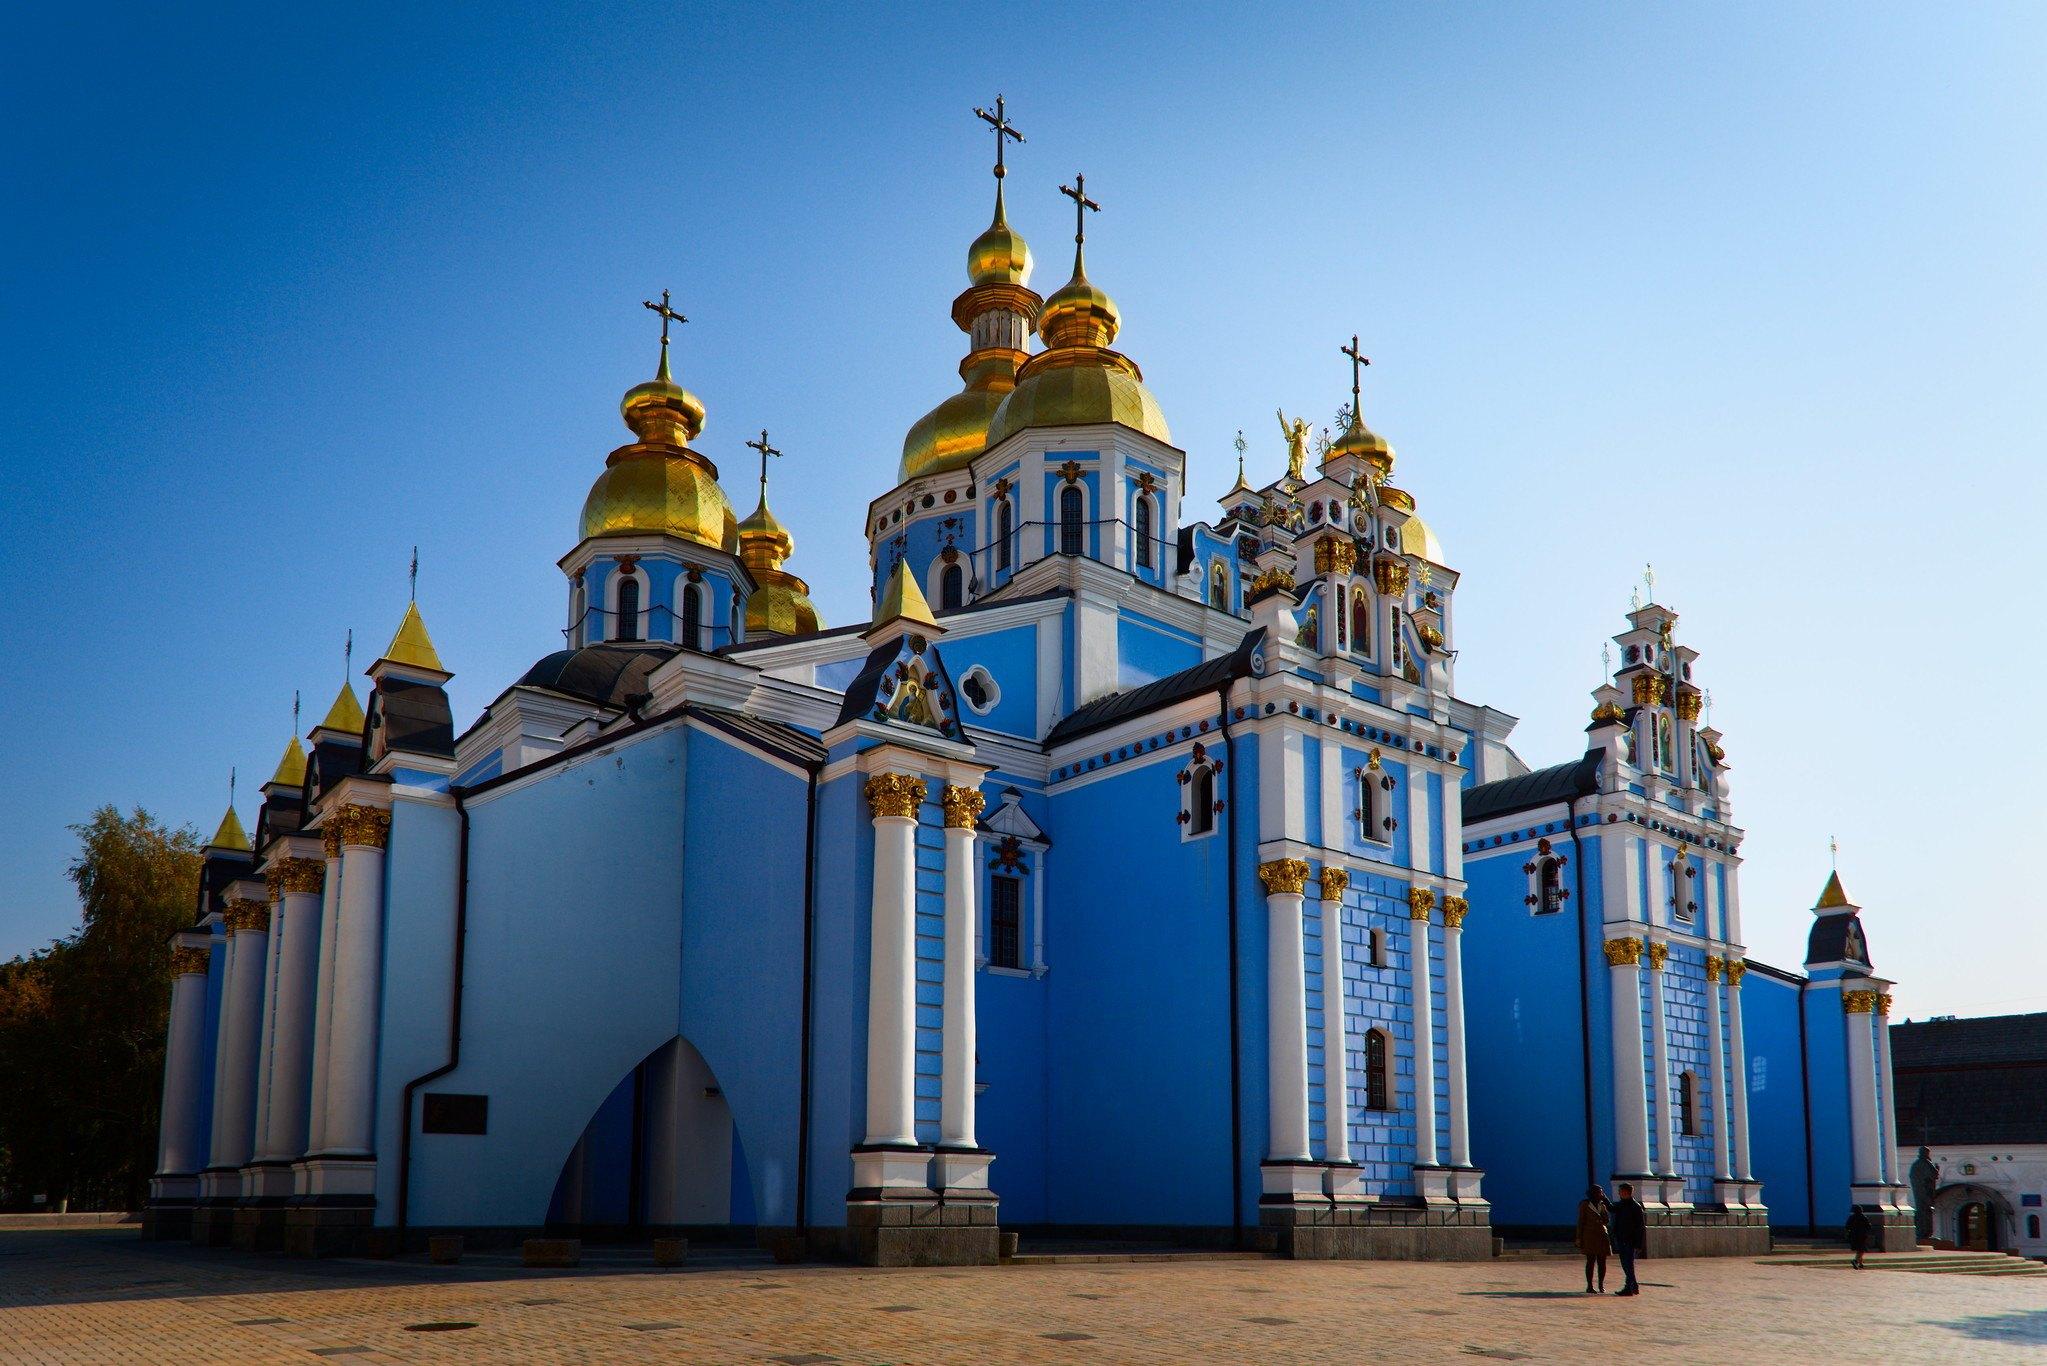 15 Best Things To Do in Kyiv, Ukraine